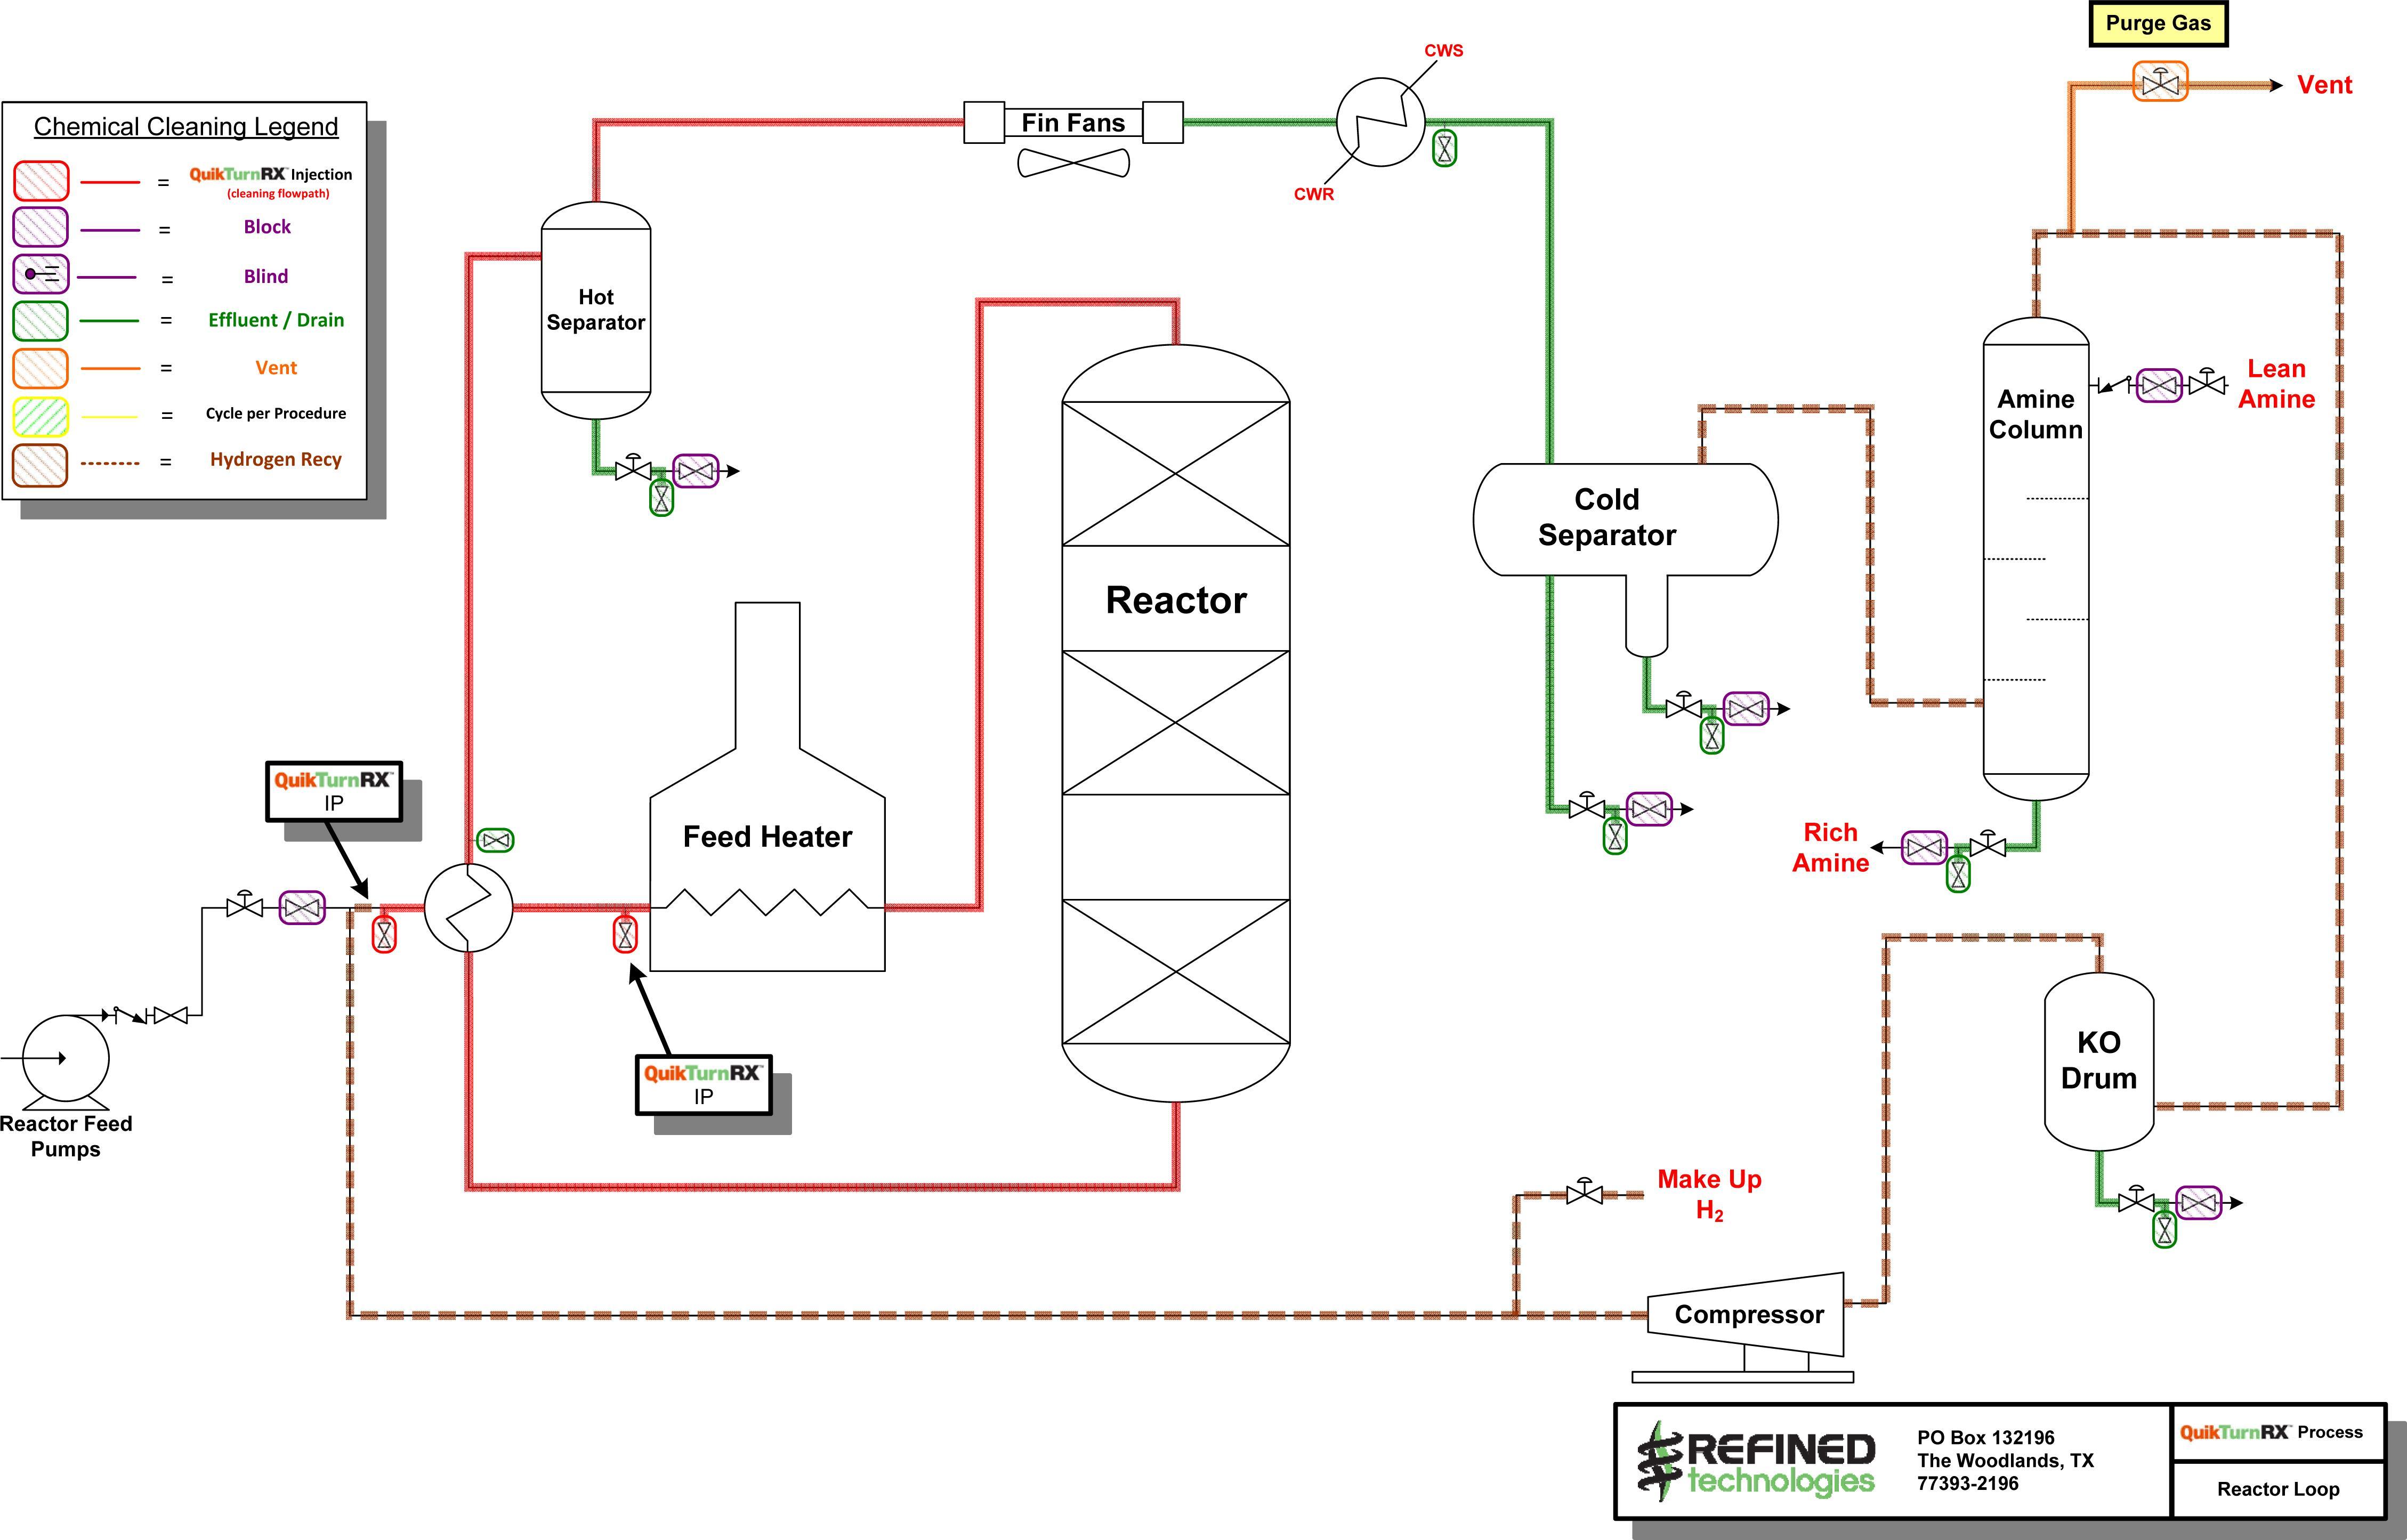 Final Installment of the QTRX Technical Tuesday